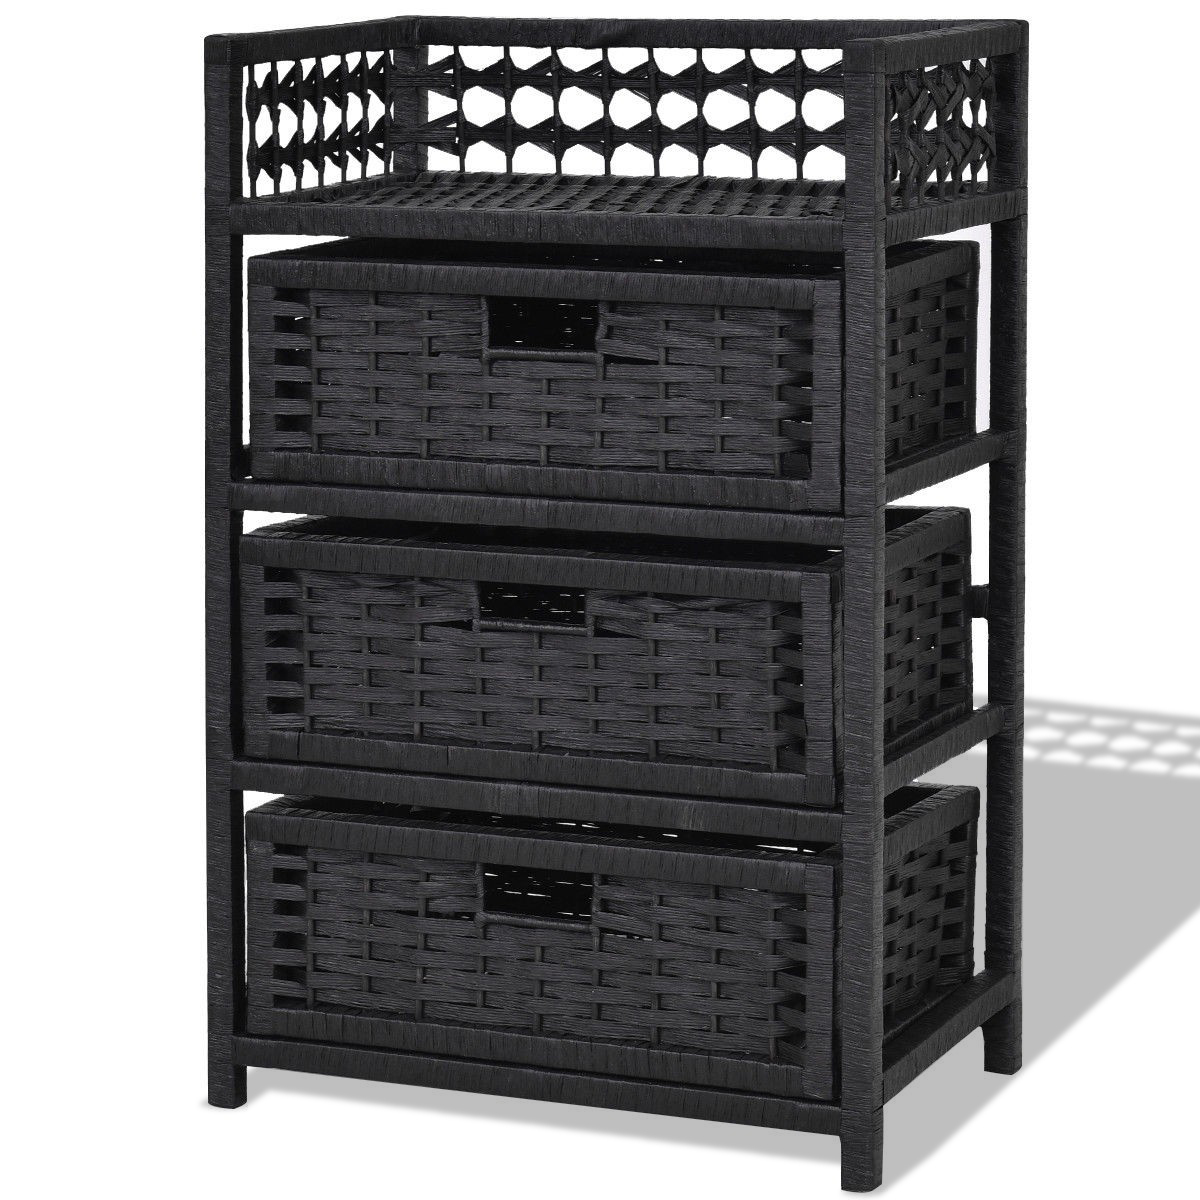 3 Drawers Wicker Baskets Storage Chest Rack-Black ...